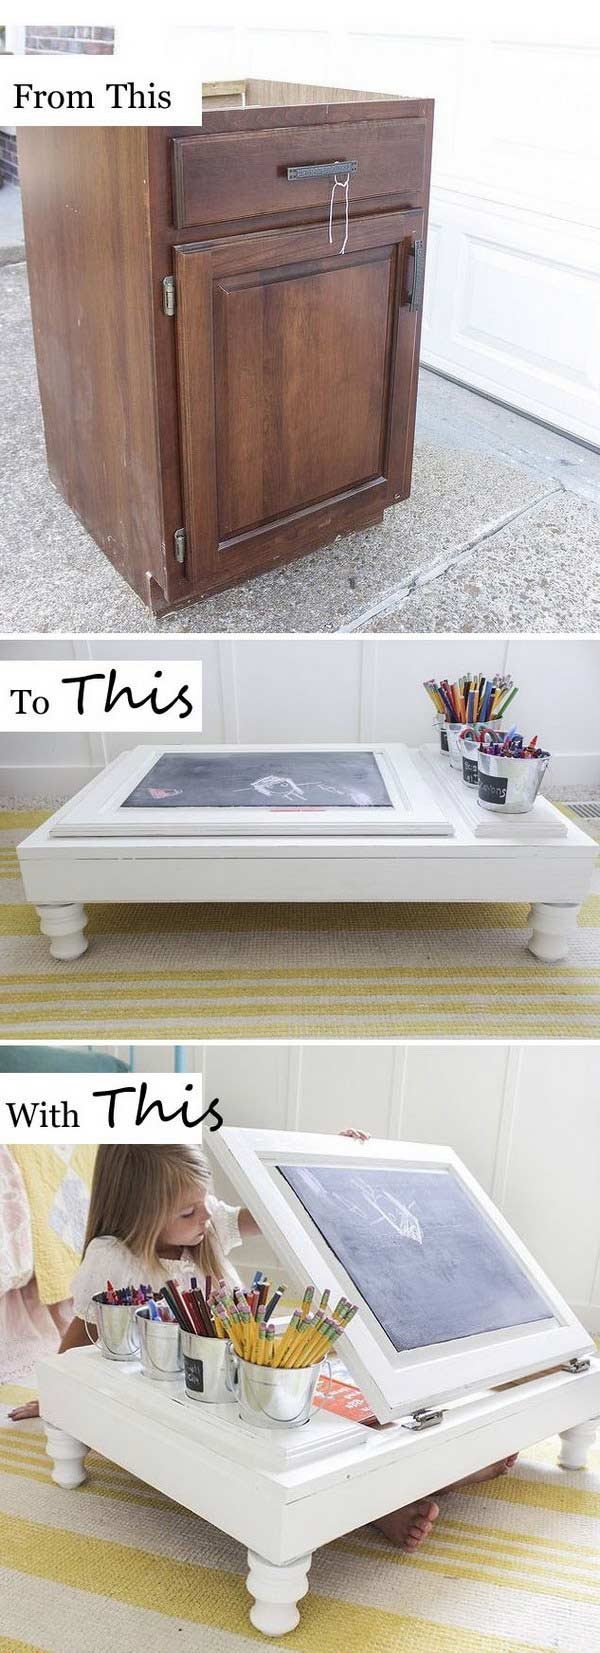 Child's Desk Rebuilt From a Kitchen Cabinet